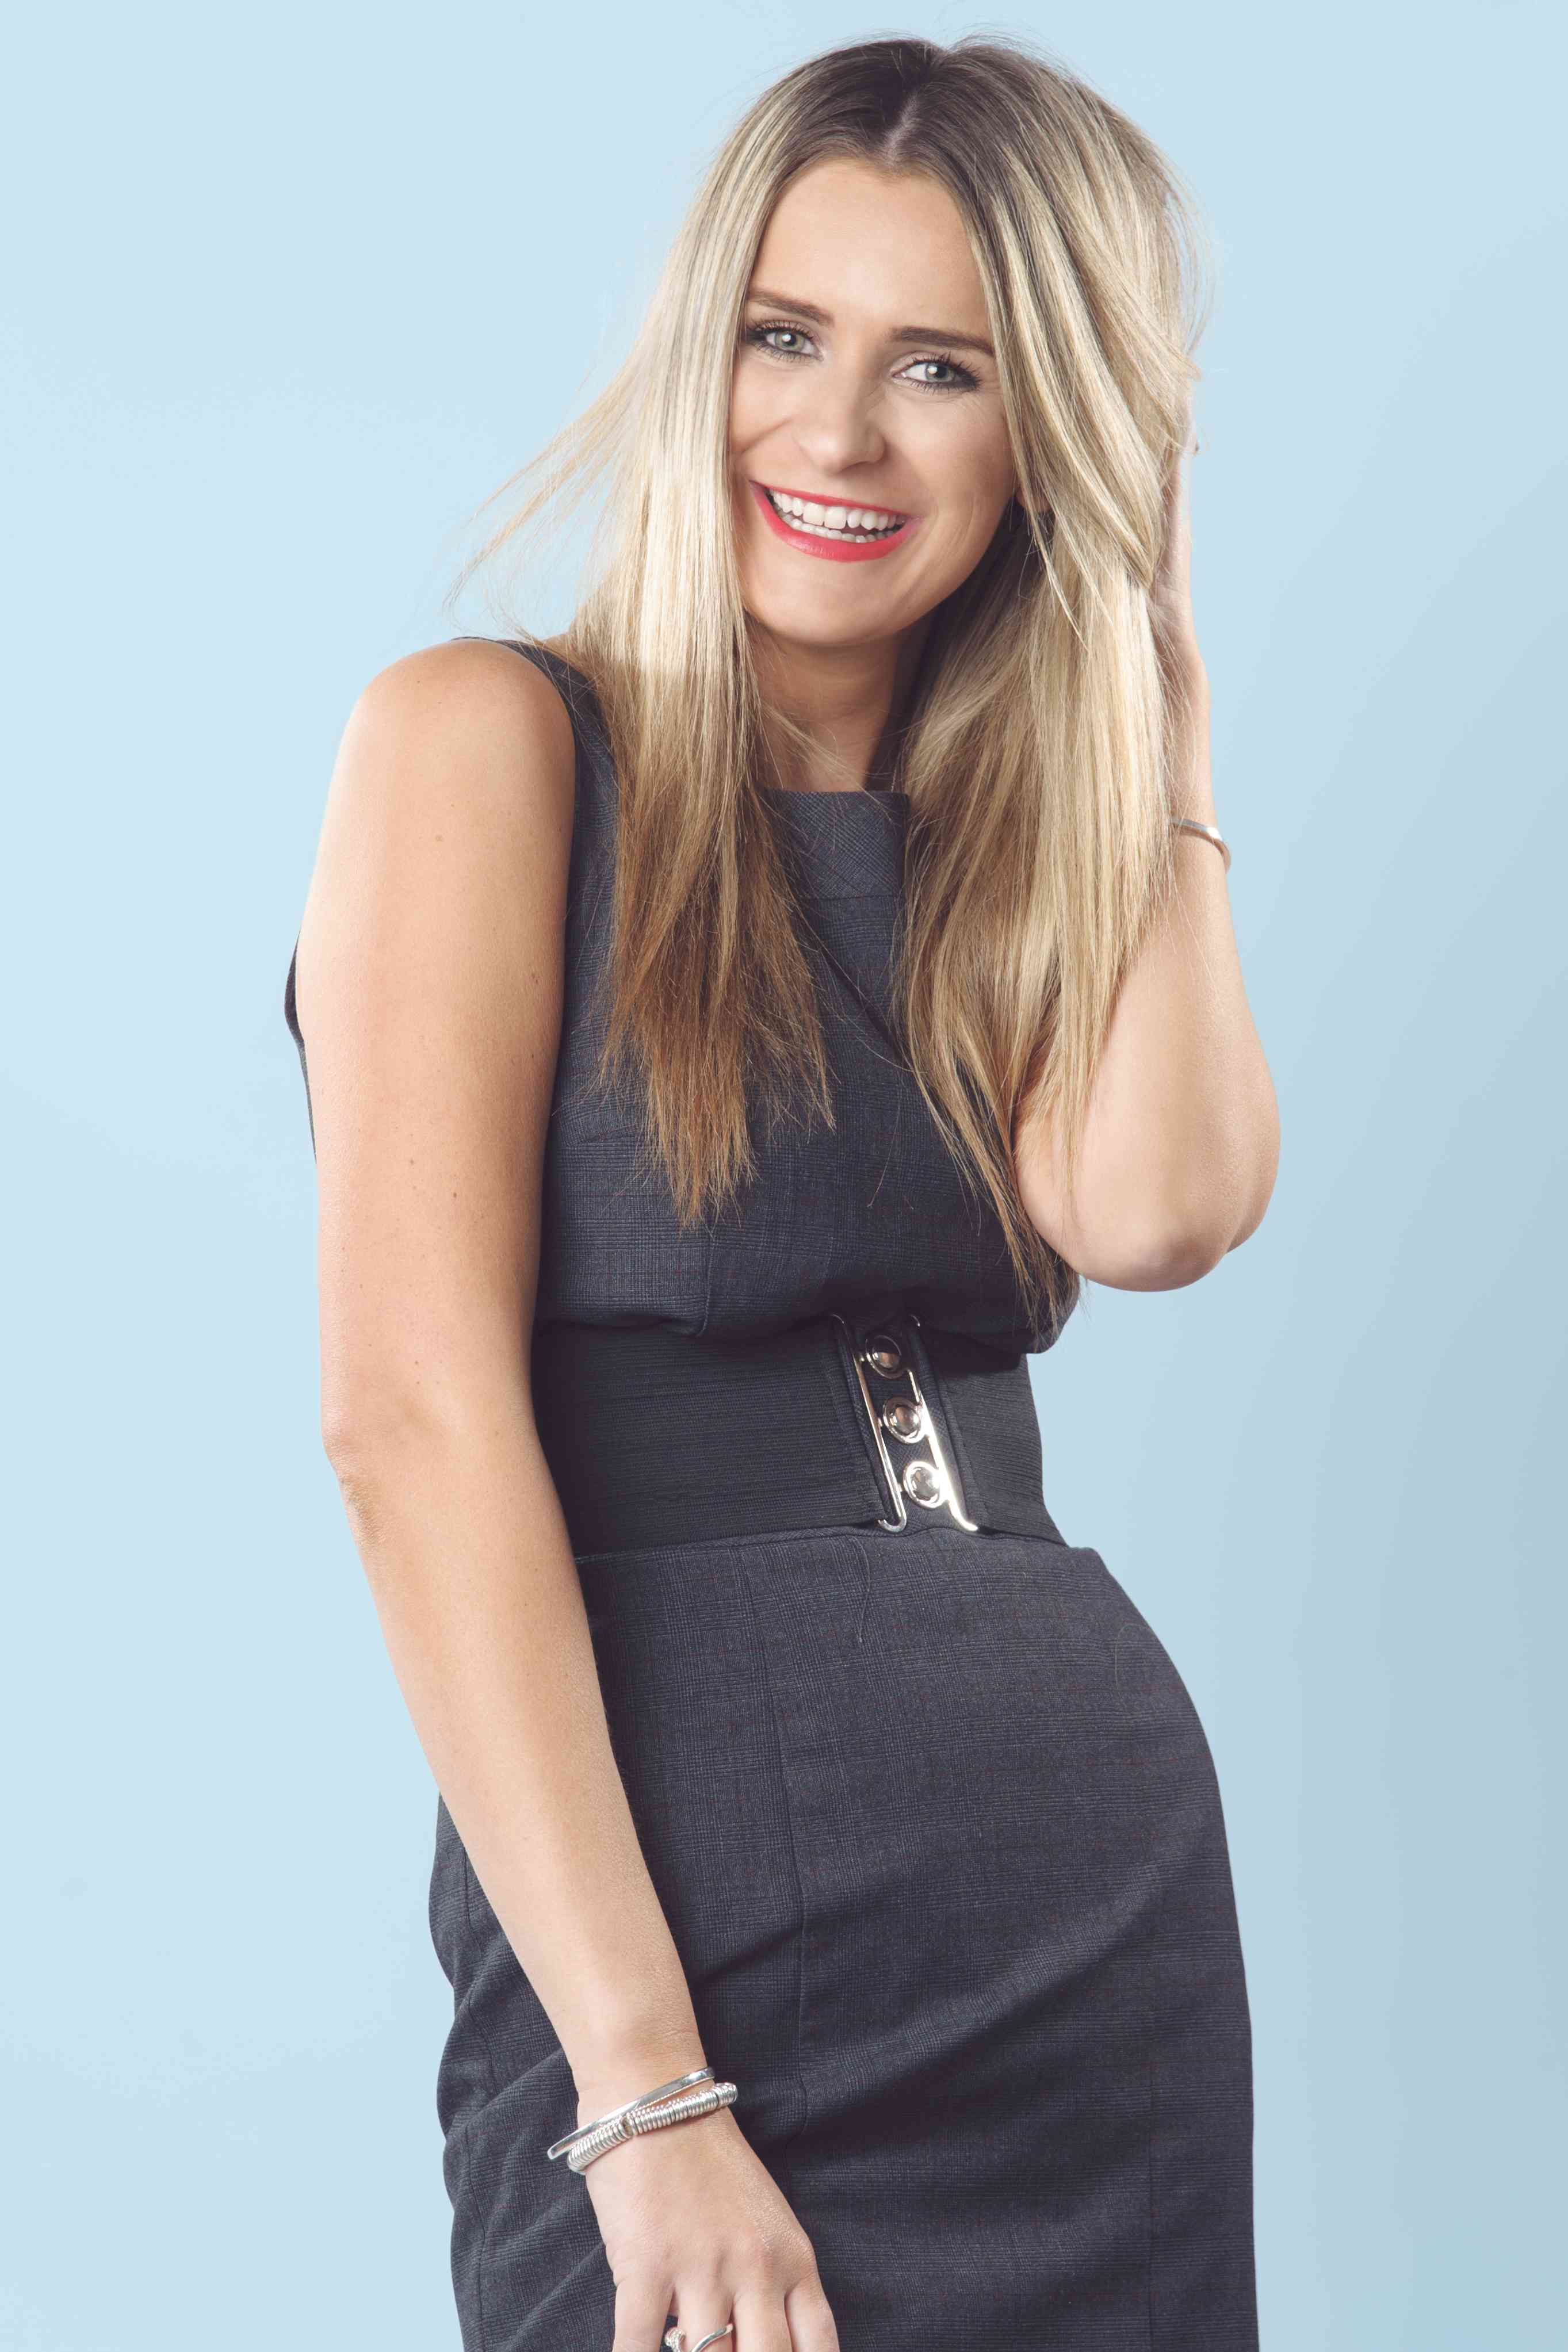 Female-Model-Leeds-Yorkshire-Photographic-New-Face-01-Sophie9311Web.jpg#asset:45902